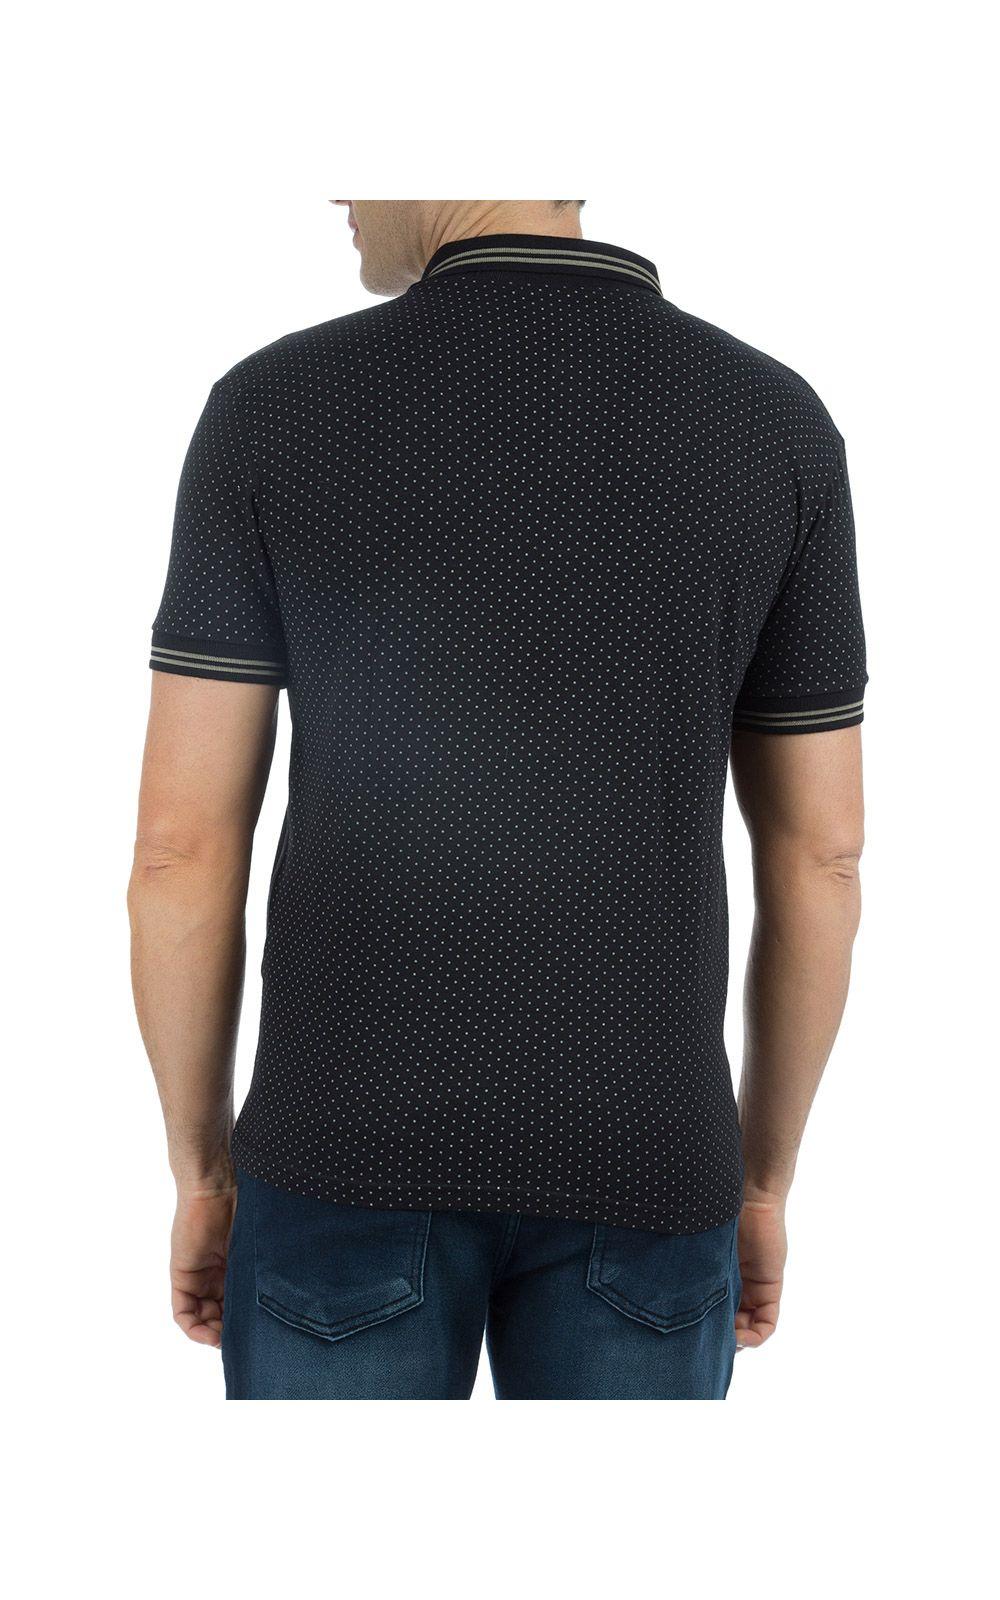 Foto 2 - Camisa Polo Masculina Preta Estampada